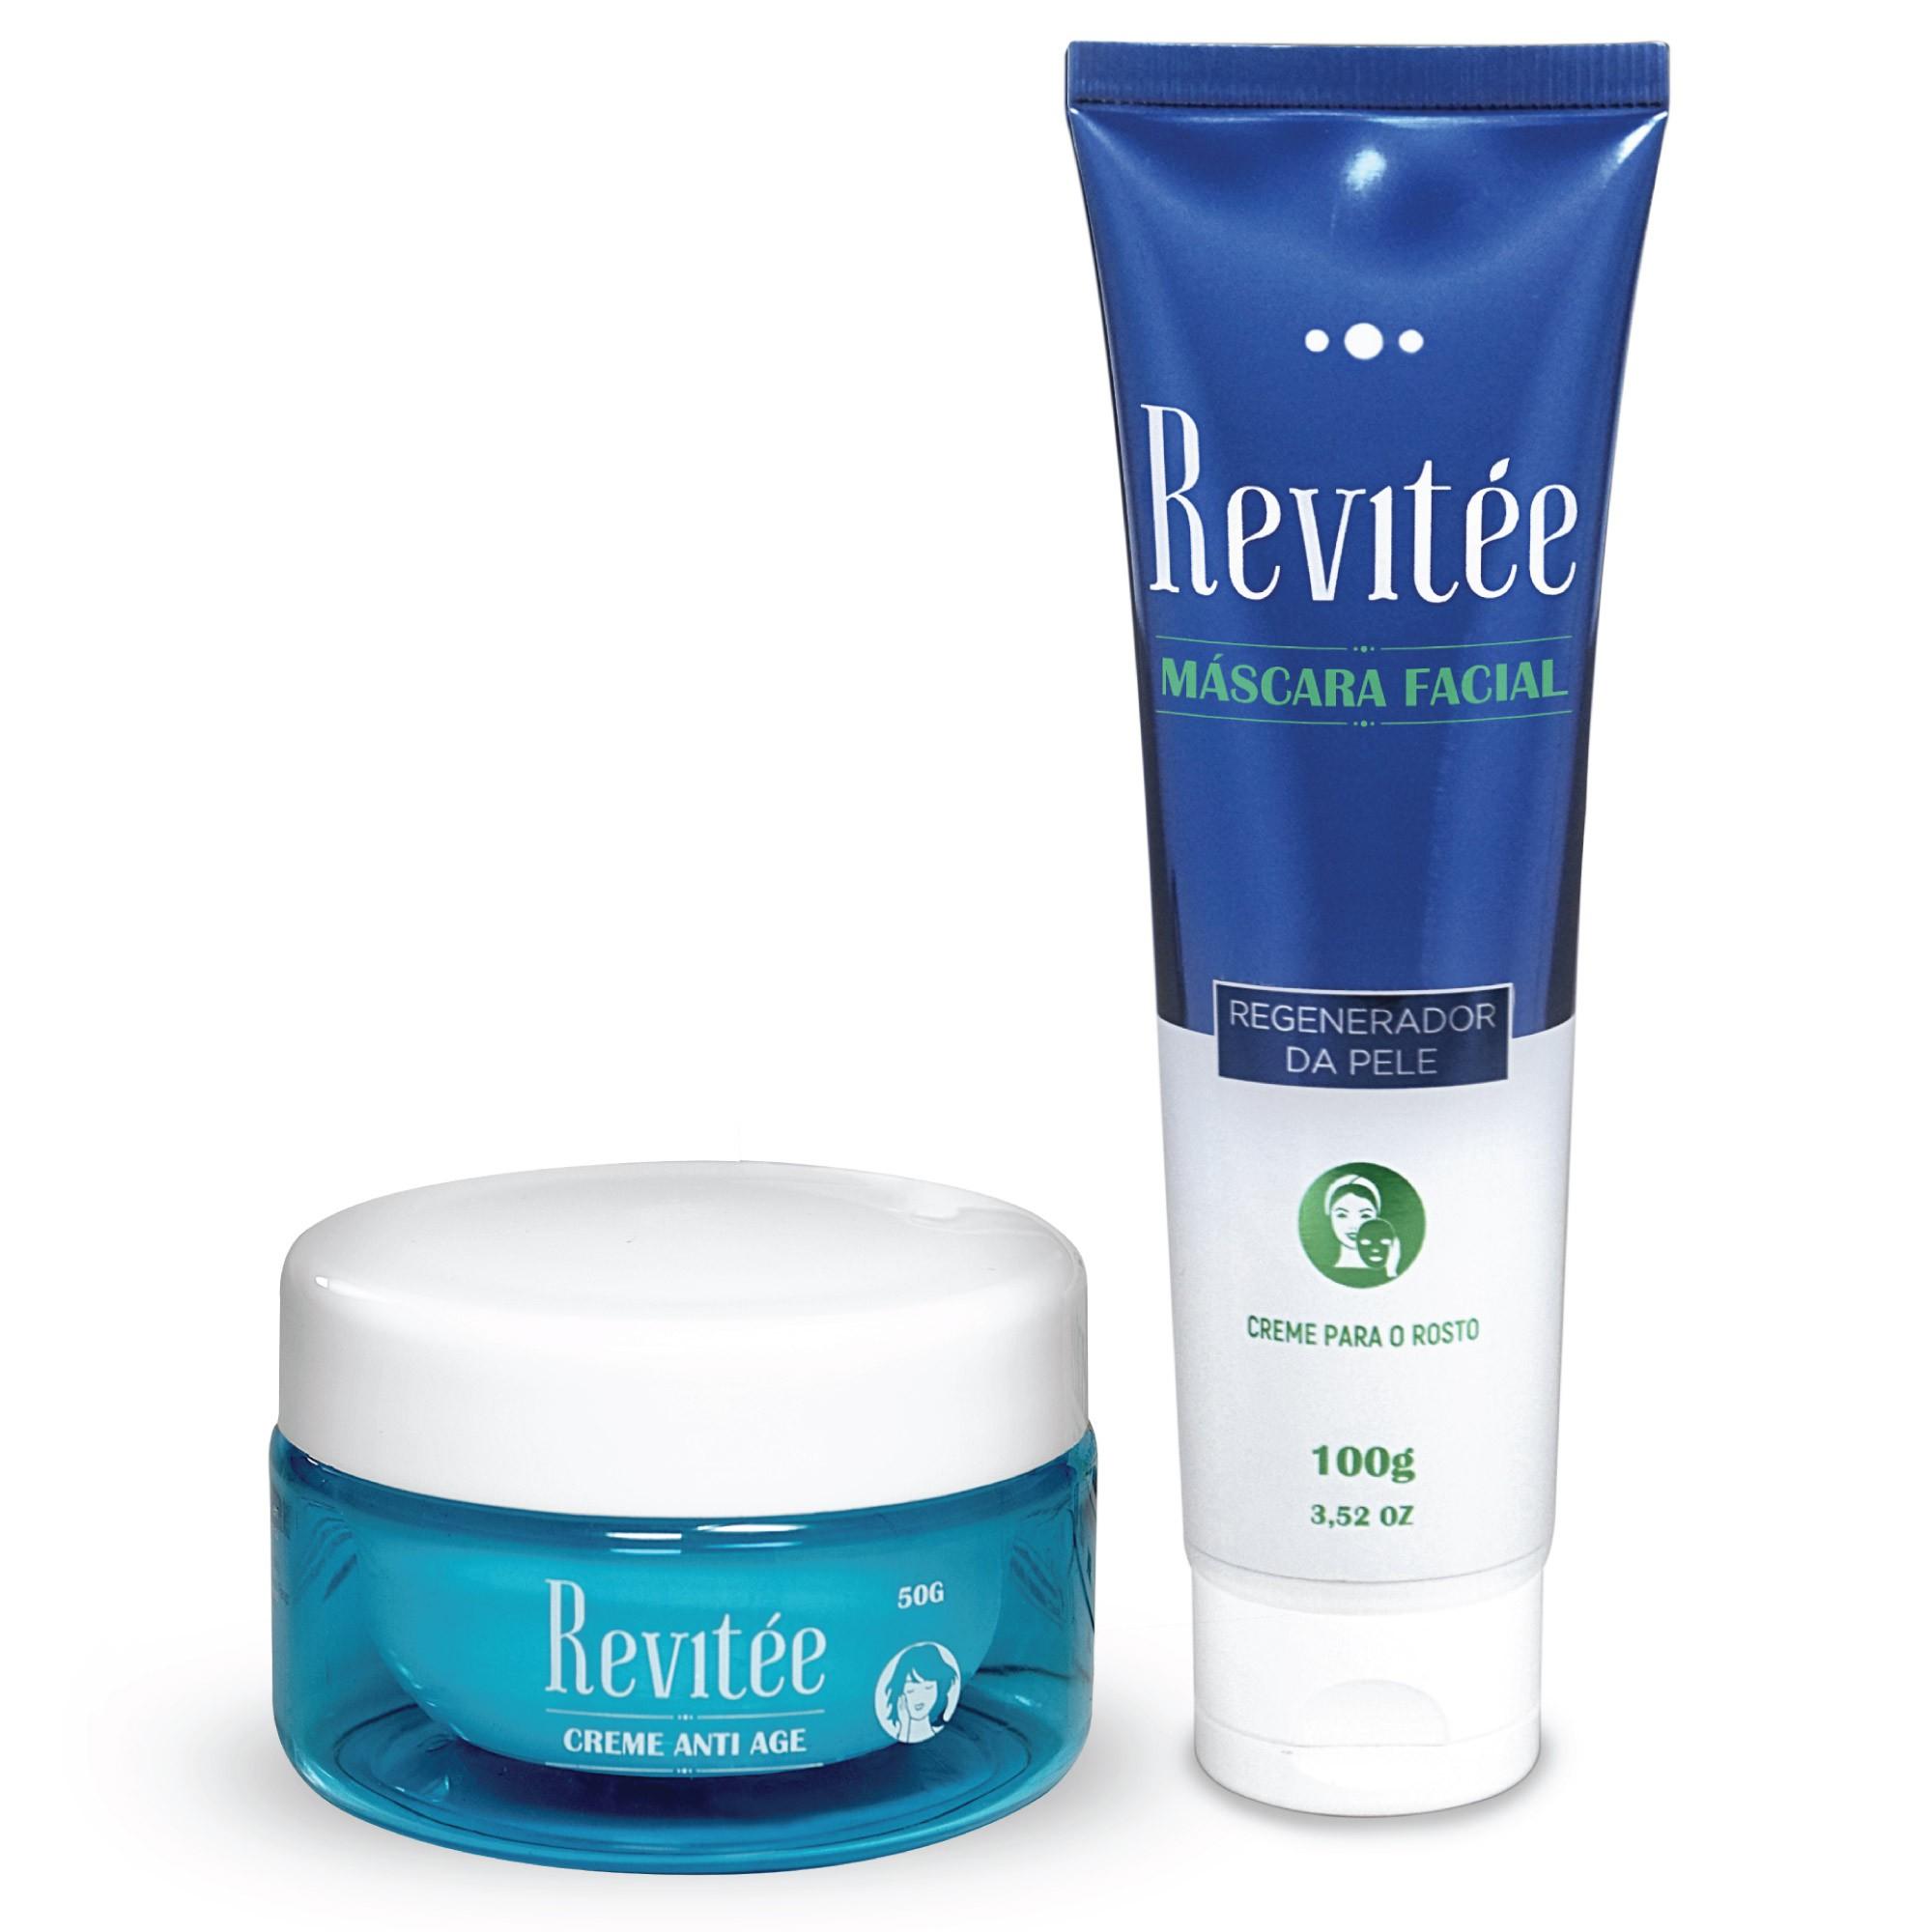 Duo Skin Care